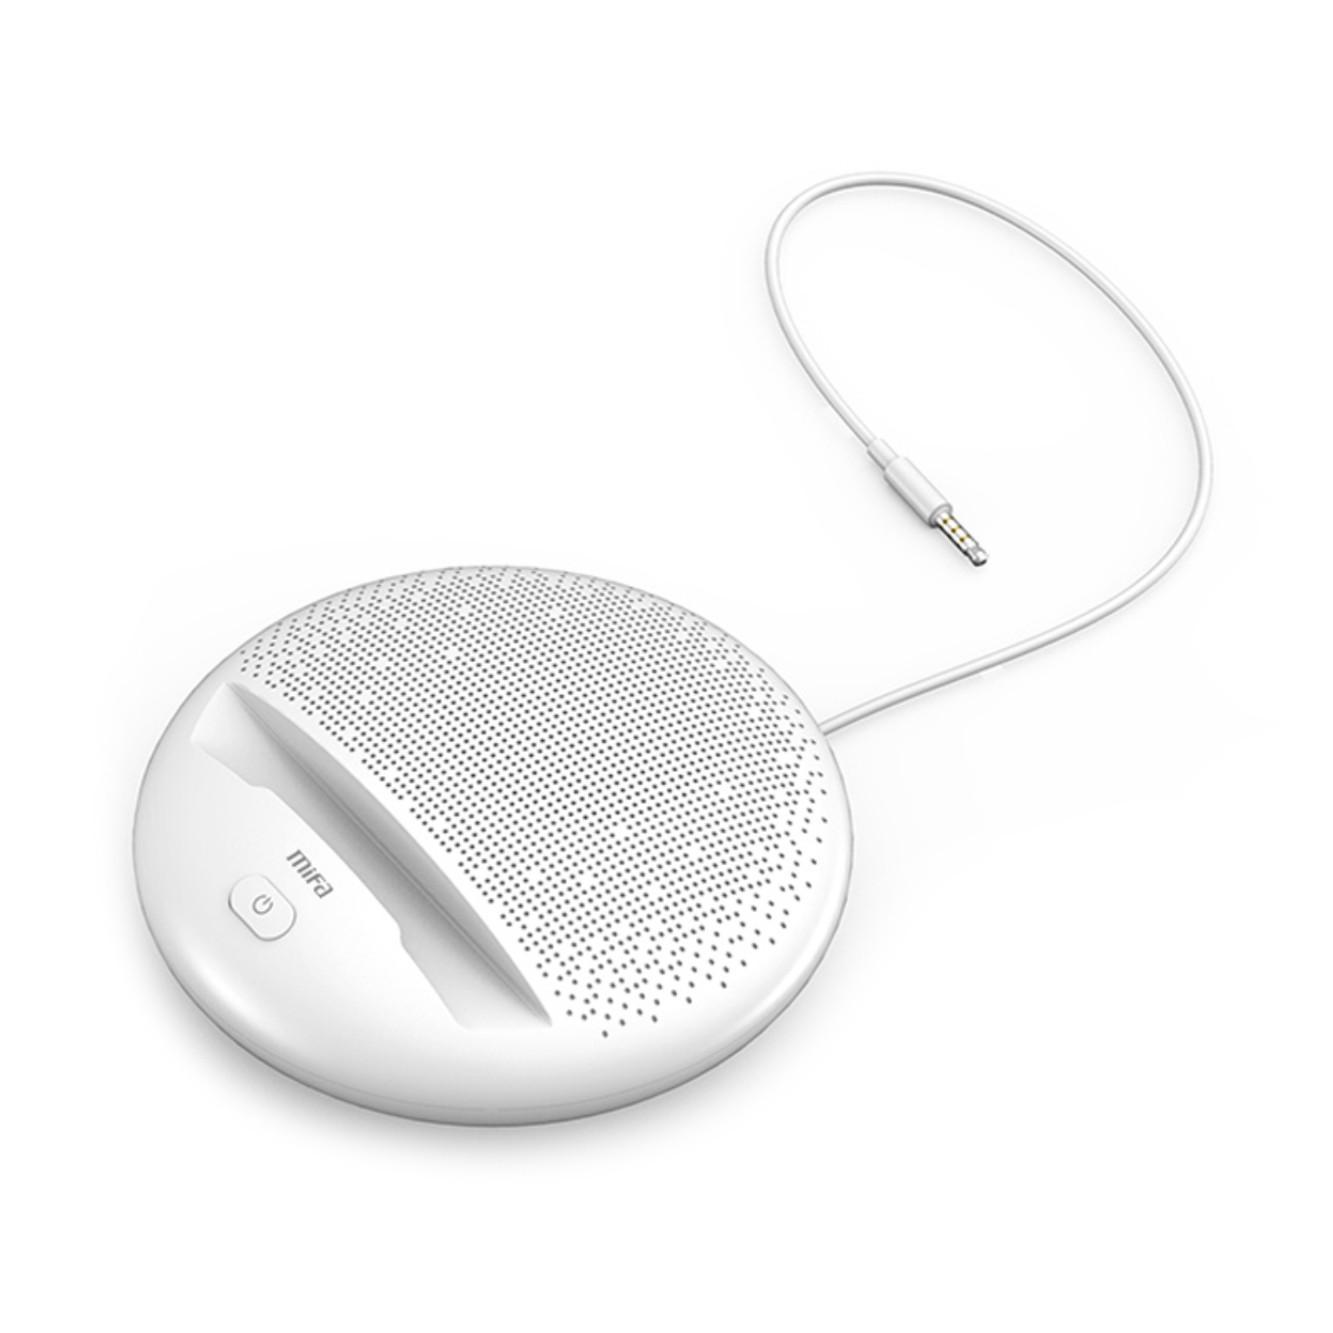 Jual Portabel Speaker Xiaomi Termurah Bluetooth Cube Mifa H2 Portable Stereo Bracket For Mobile